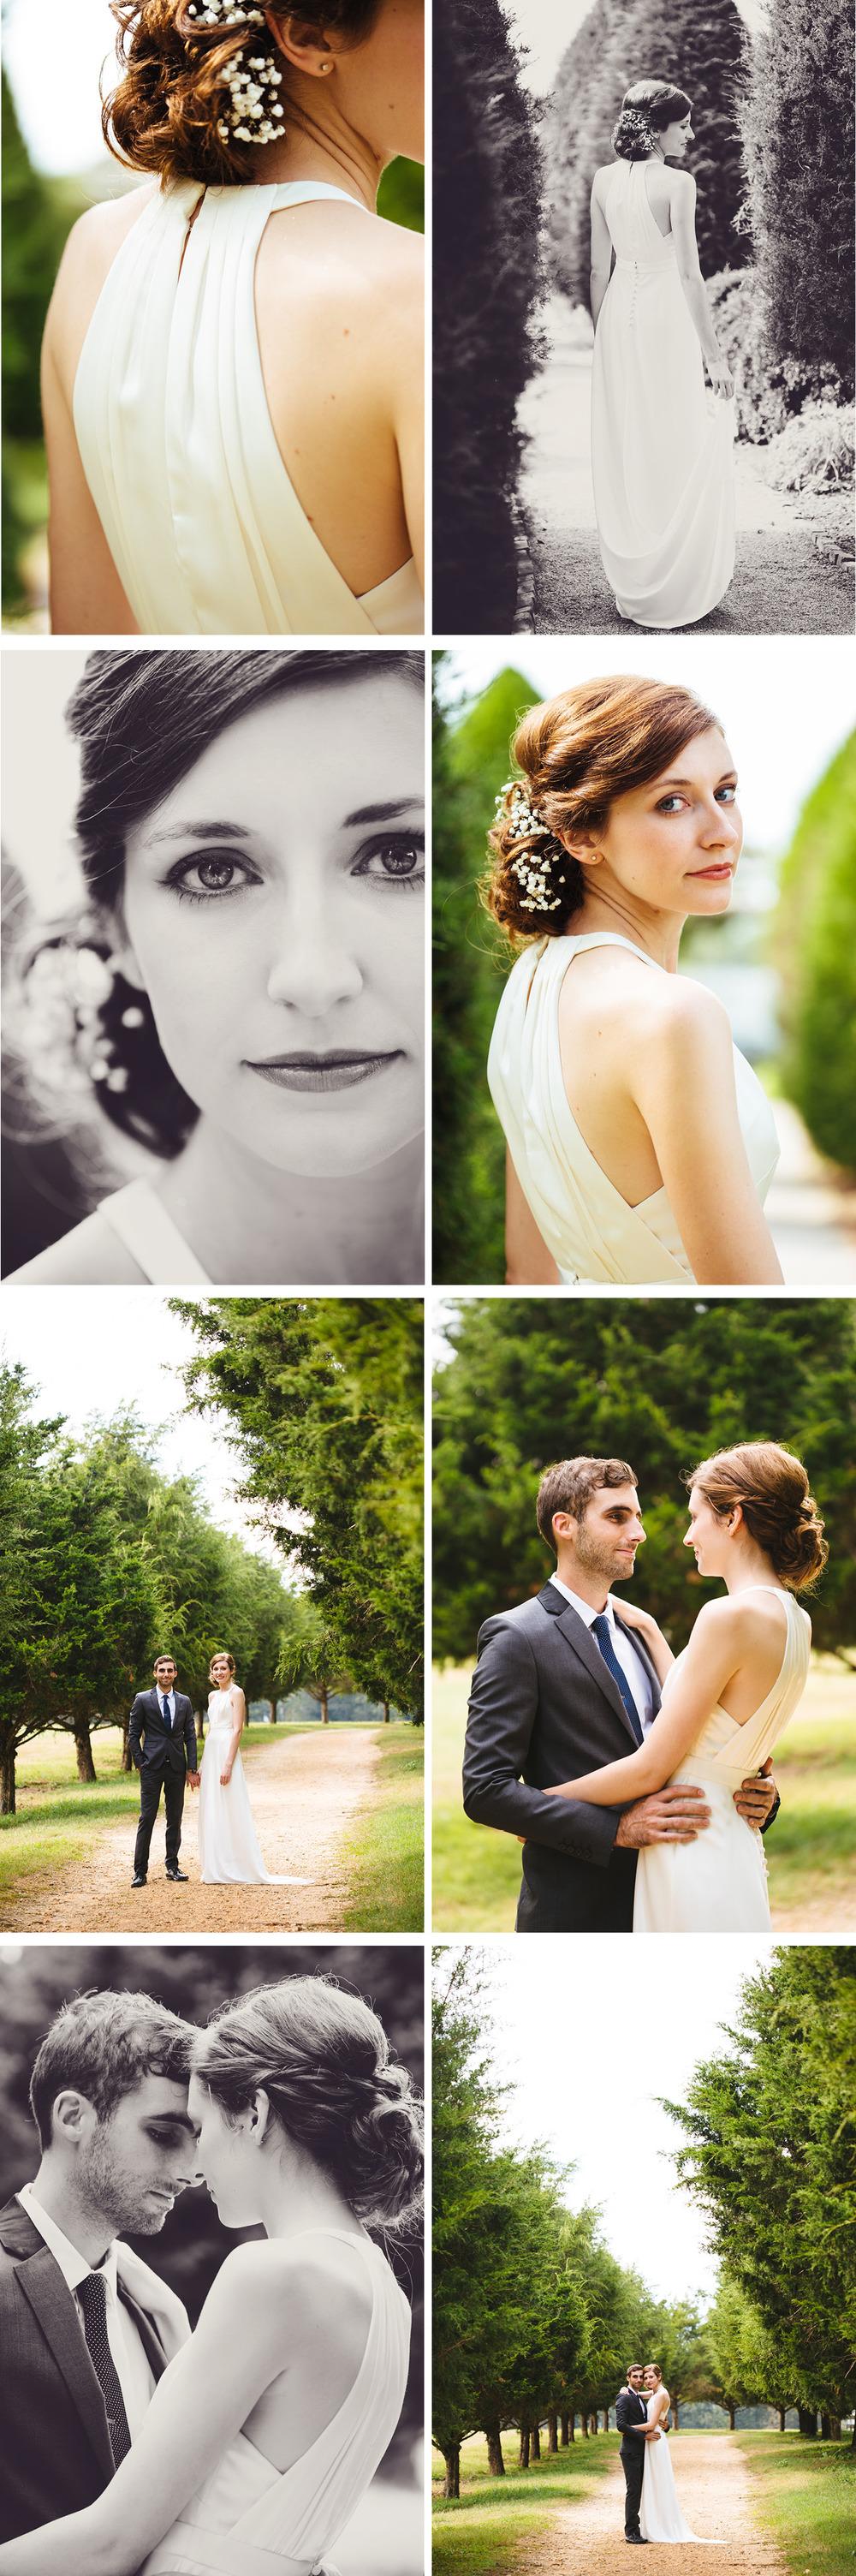 CK-Photo-Nashville-Wedding-Photographer-TN7.jpg